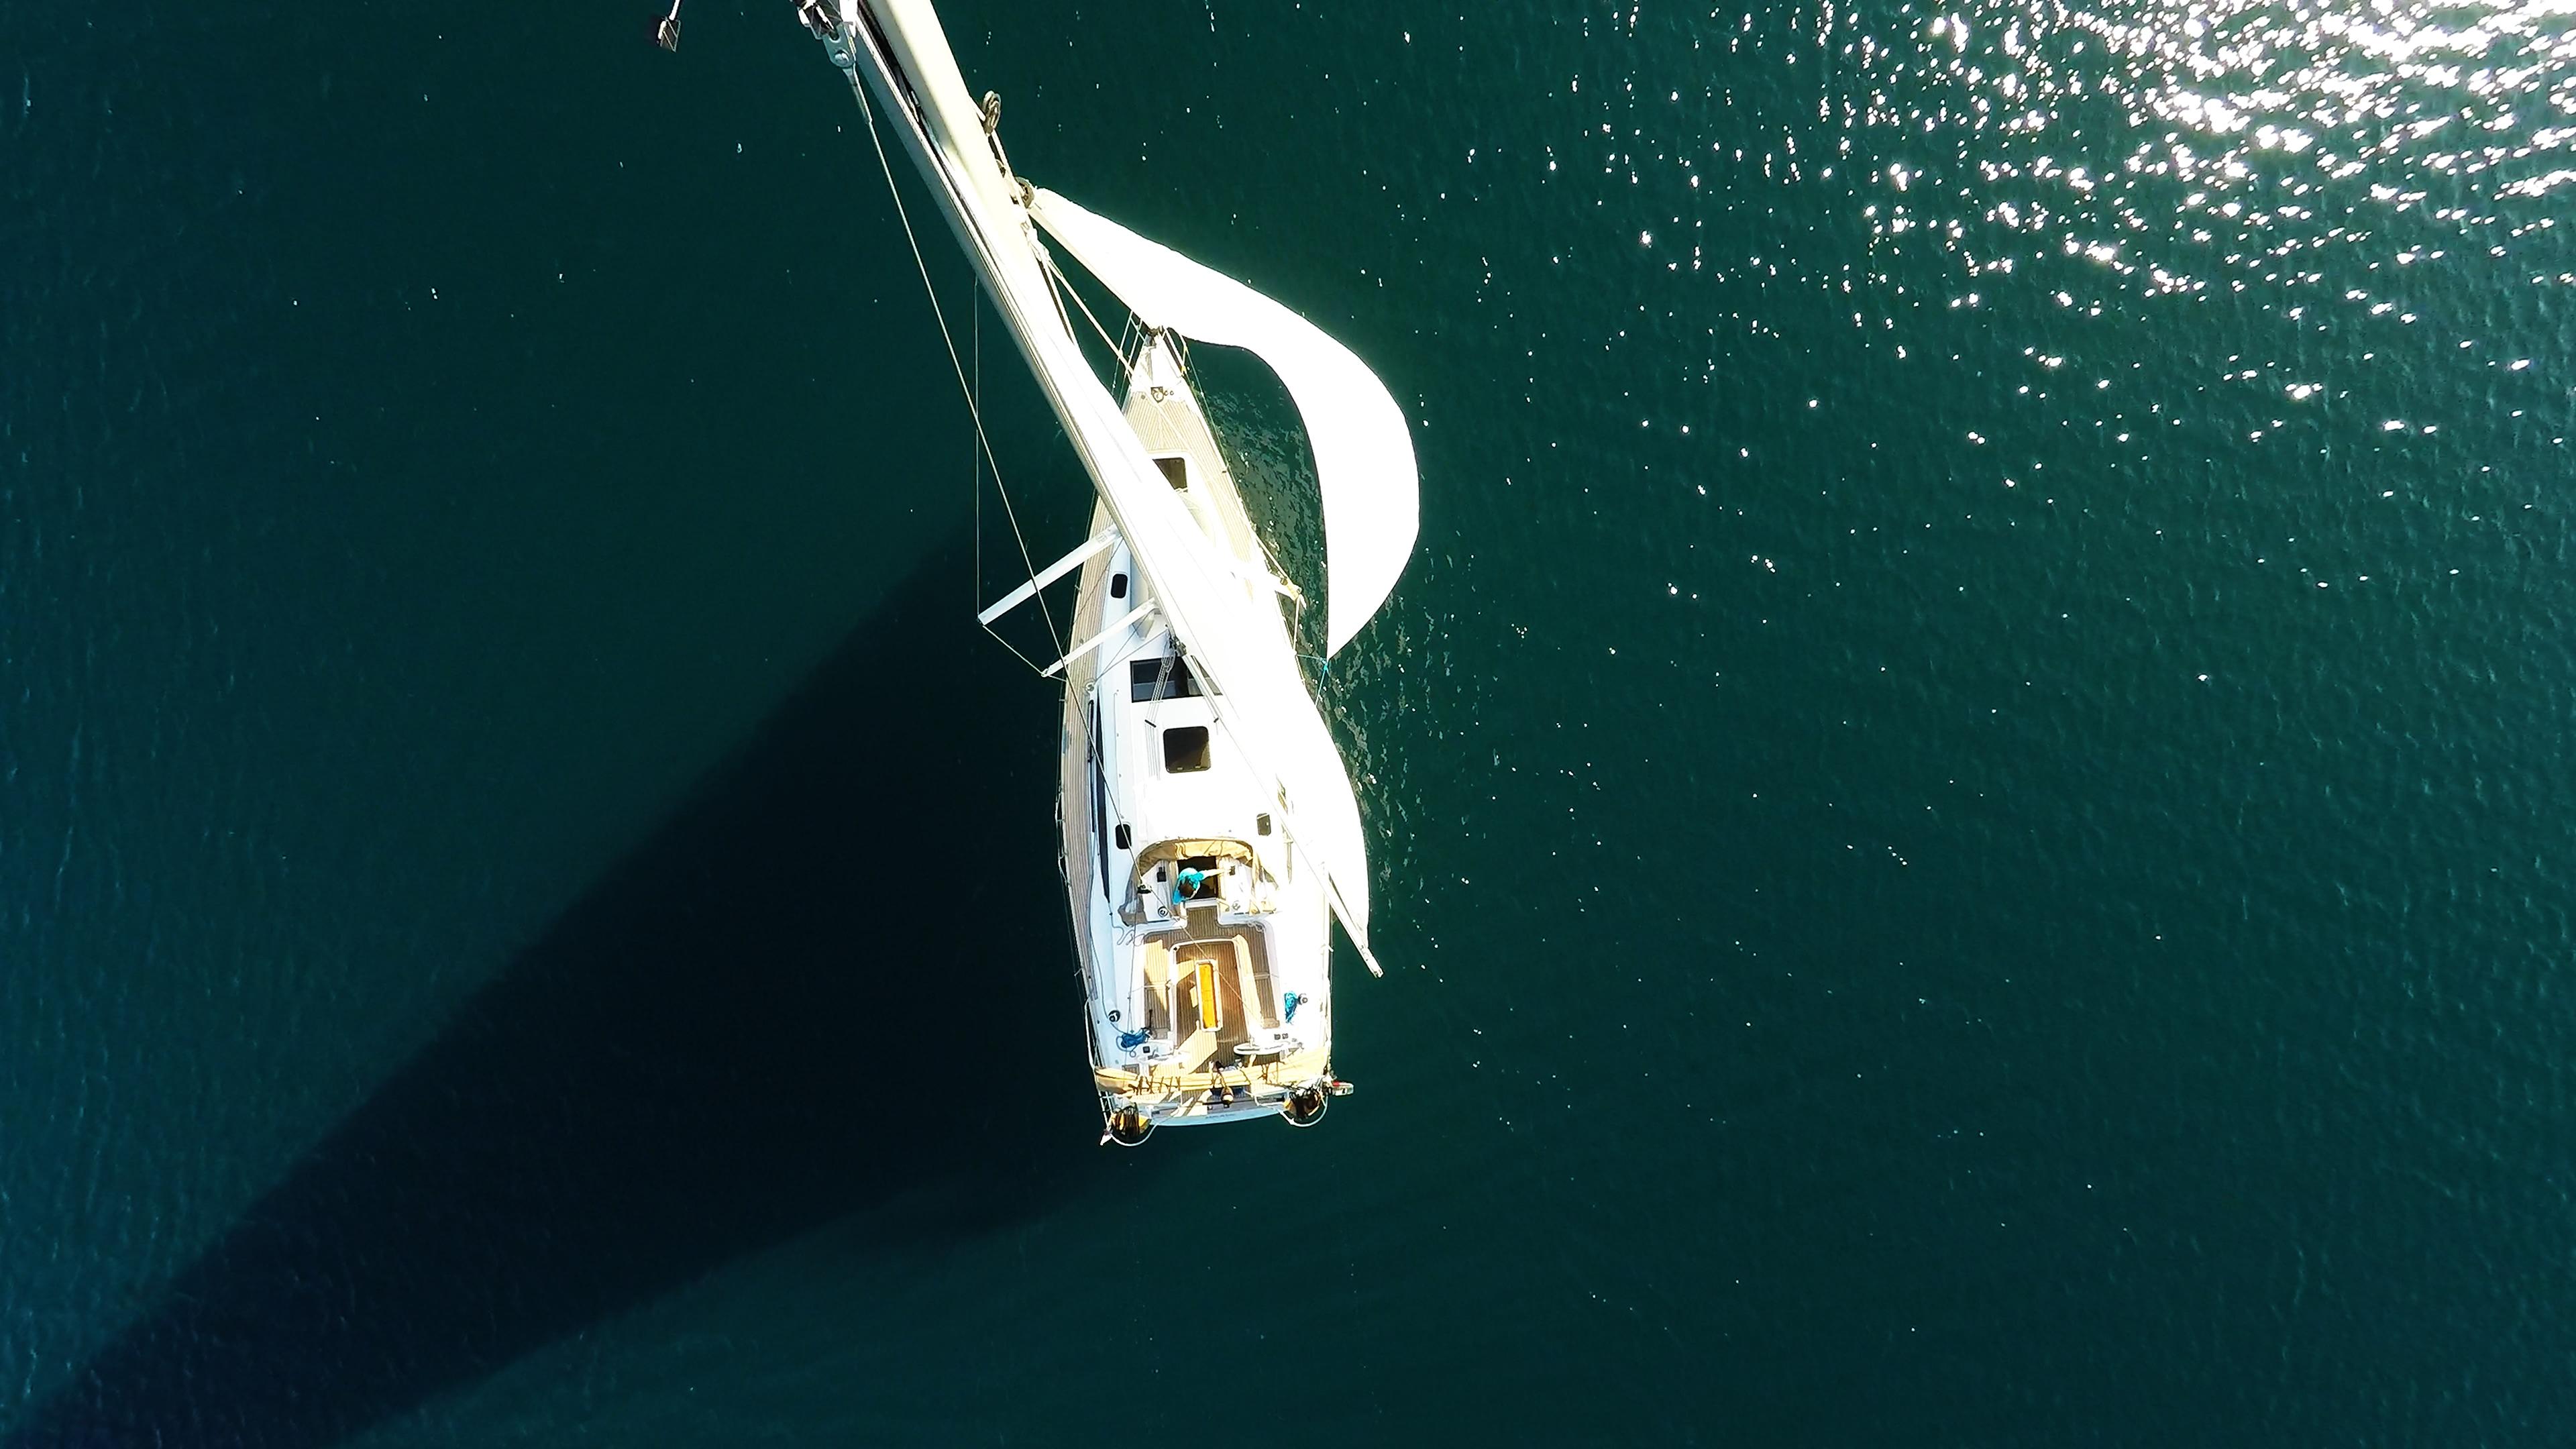 barcha a vela cima dell'albero yacht a vela elan 45 impression vele